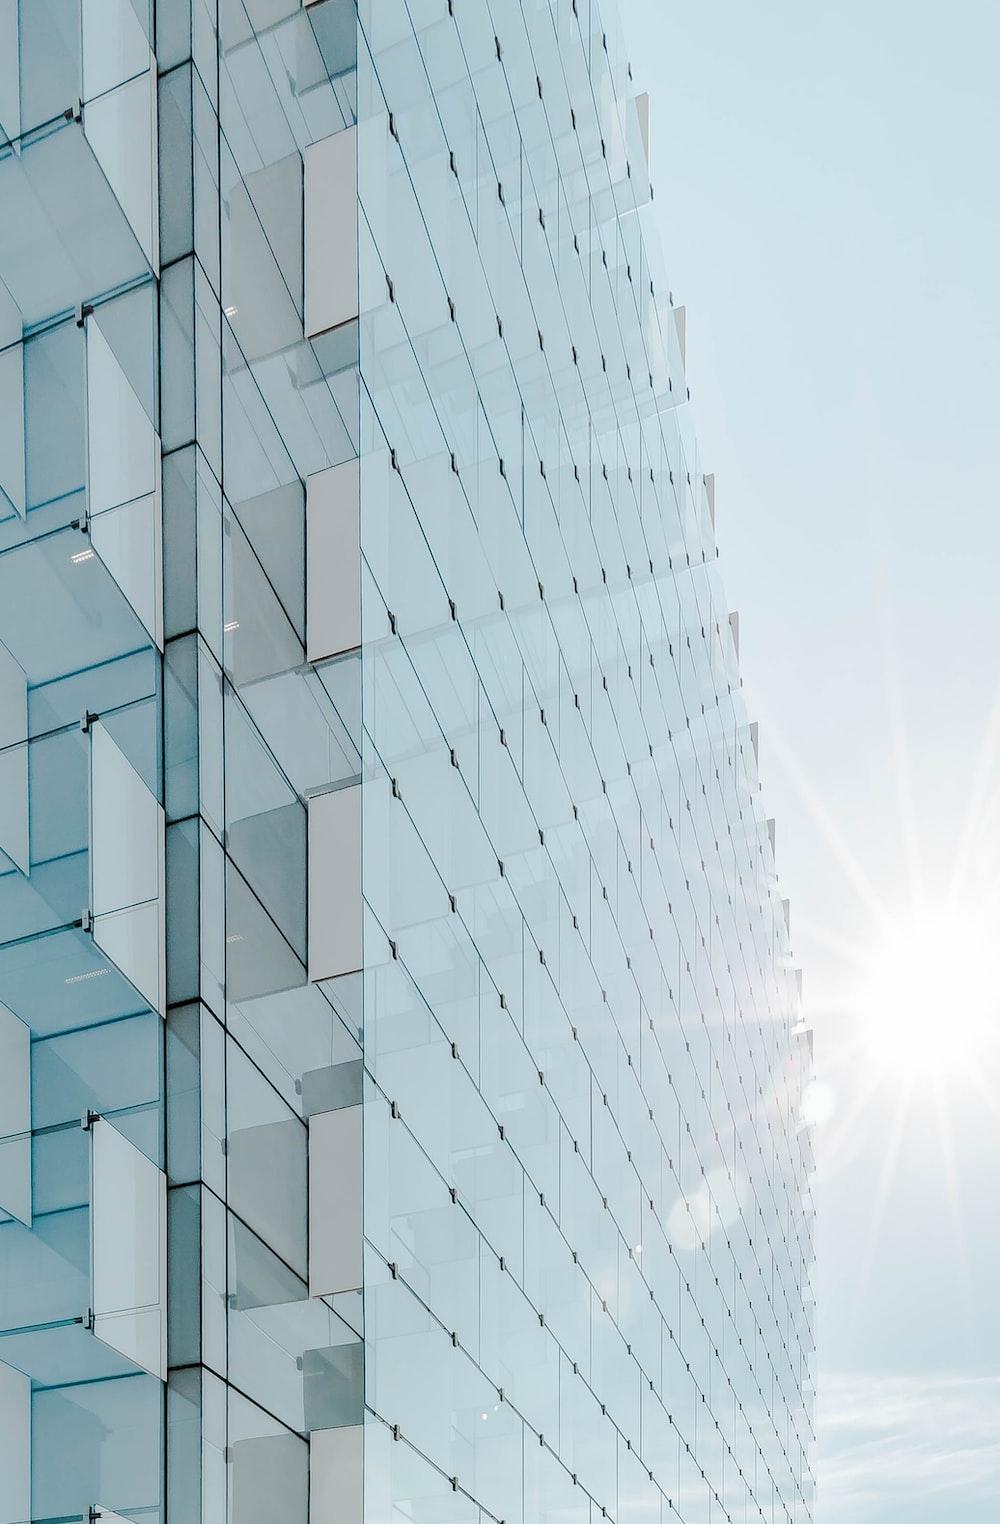 glass panel high-rise building under blue sky with sun raise